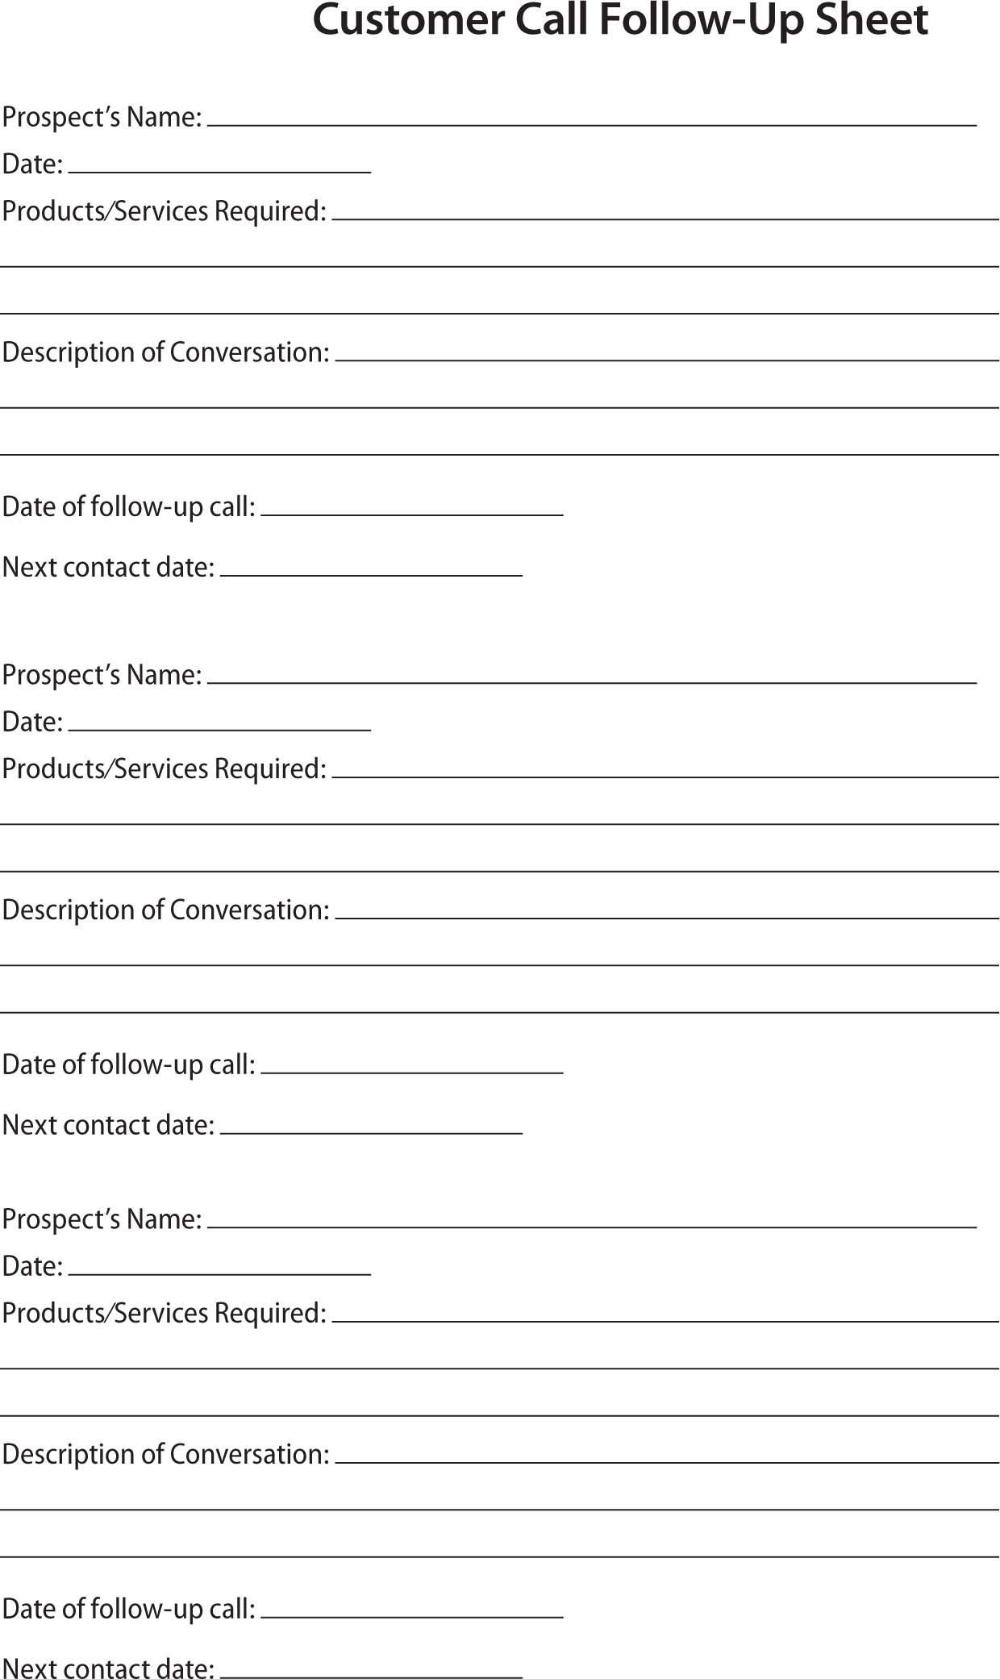 Prospect Sheet Customer Call Follow Up Call Sheet Catering